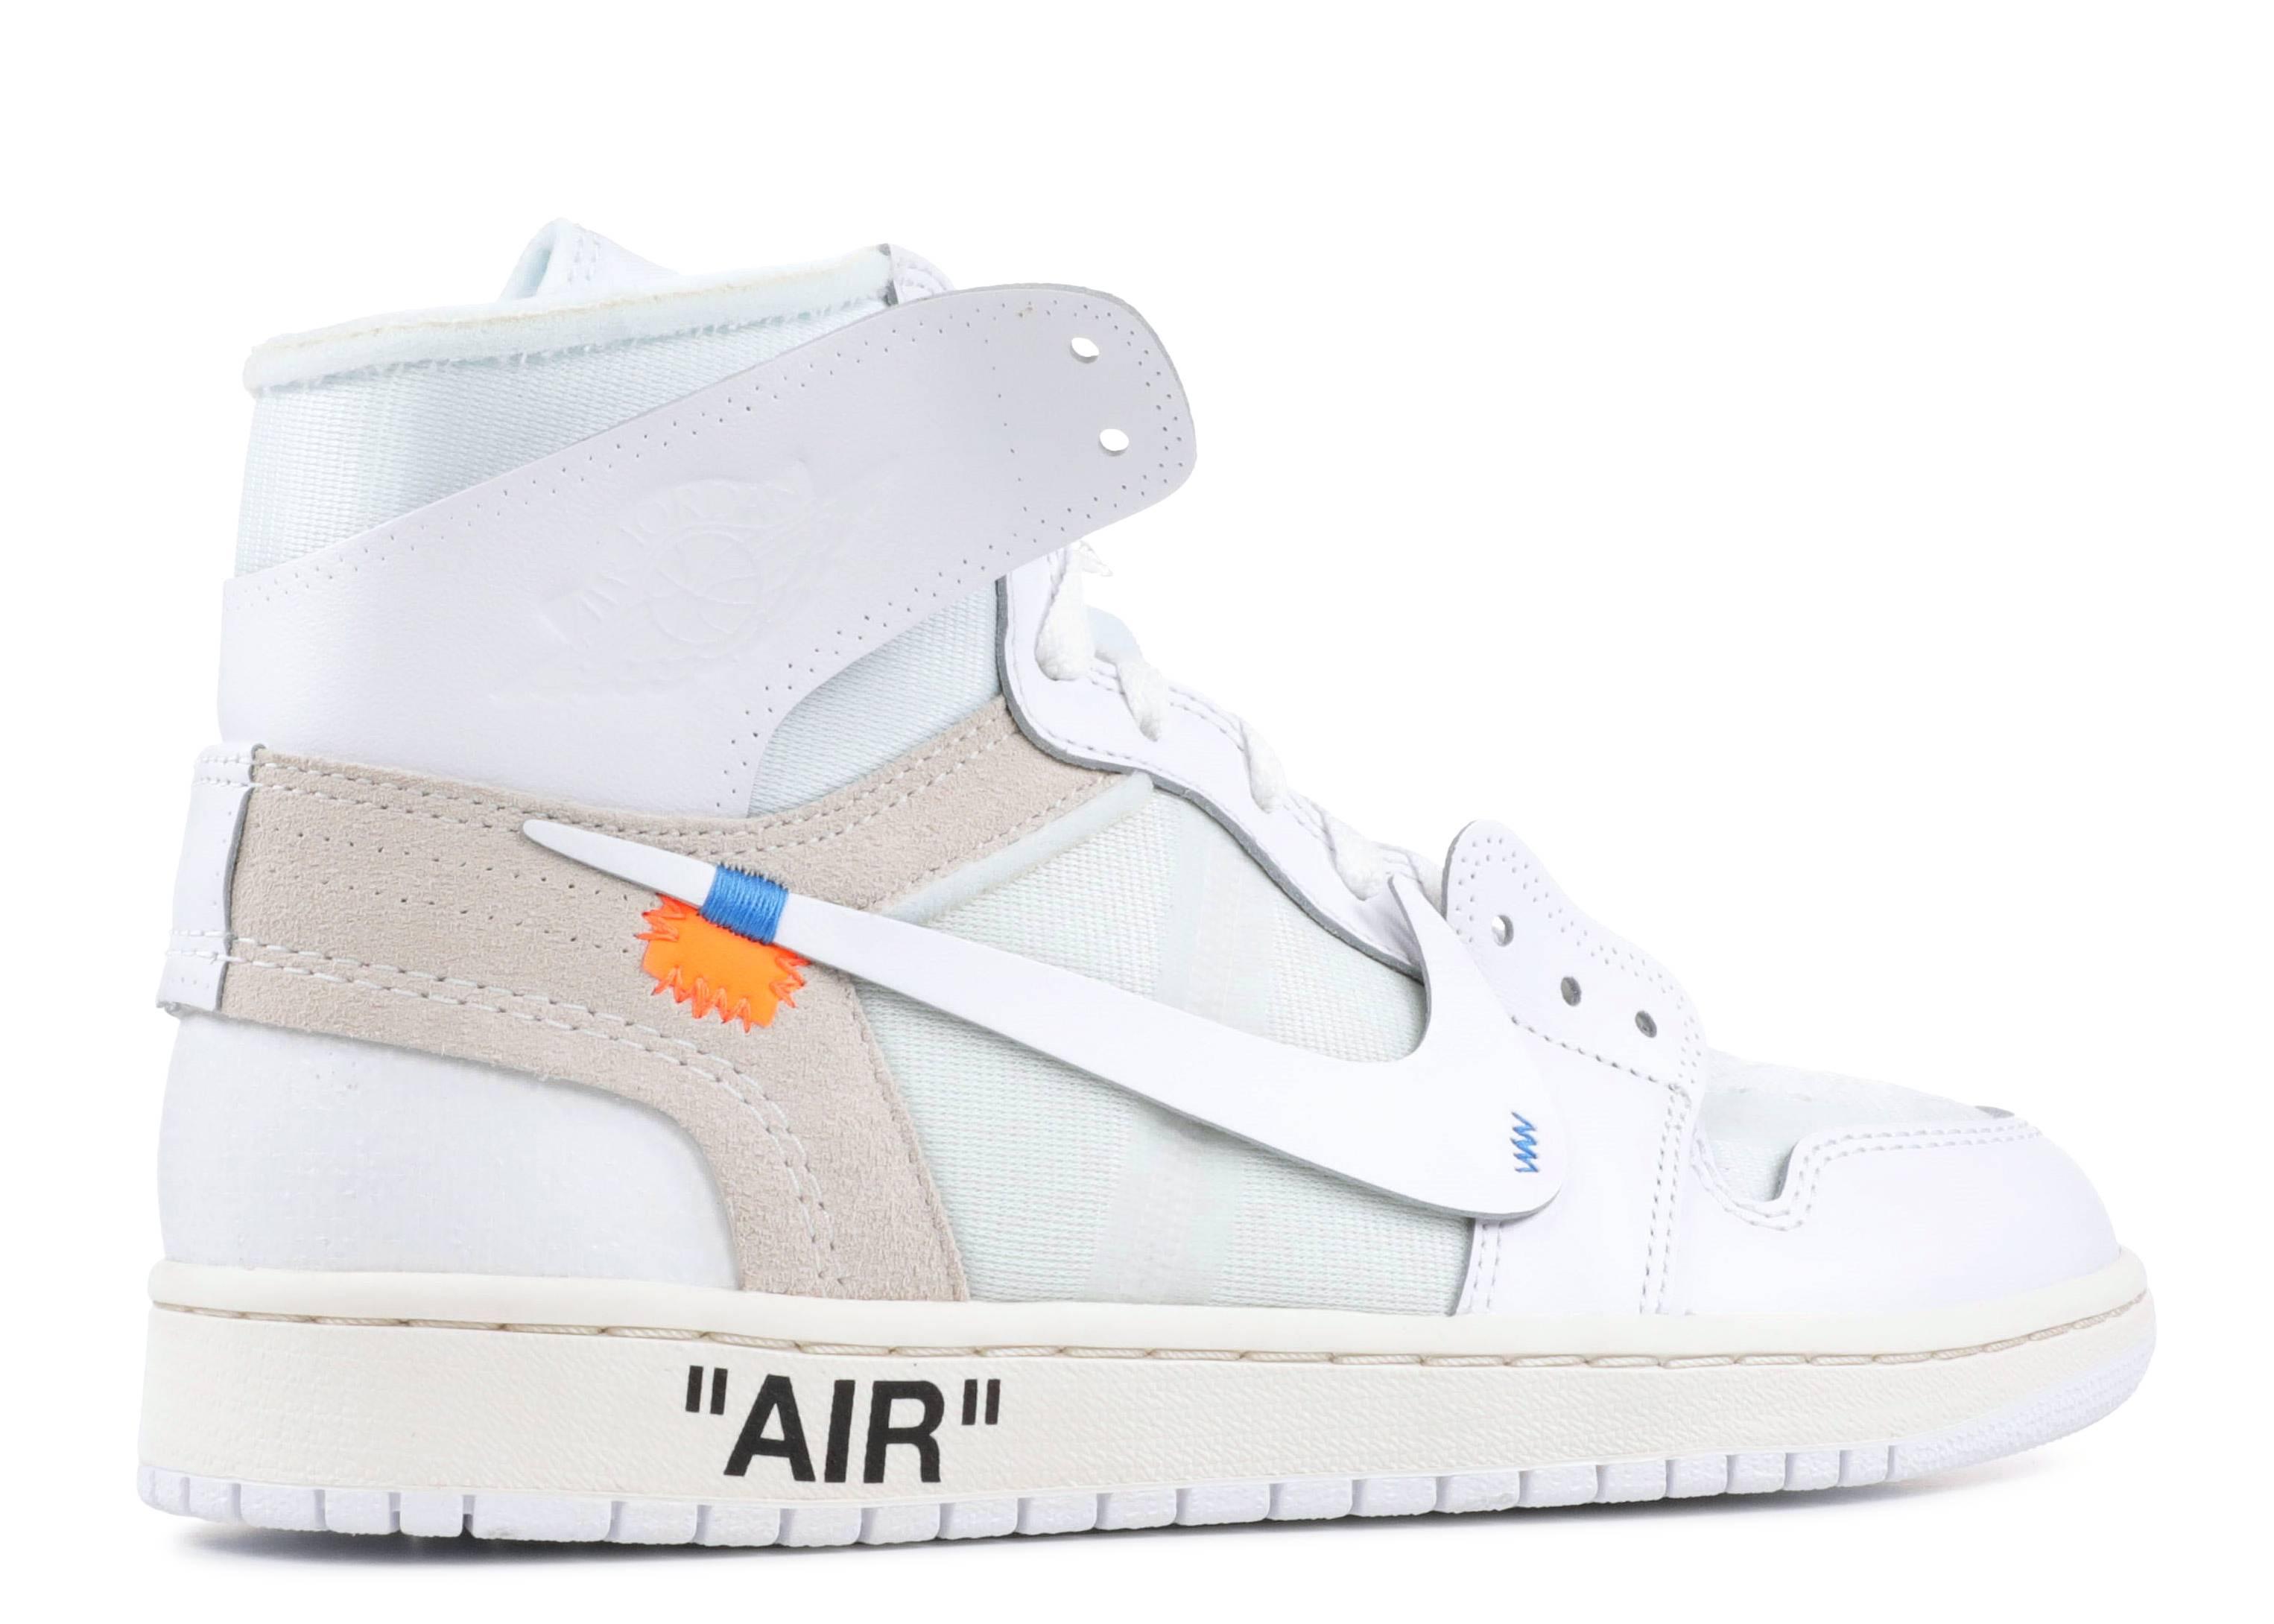 exposición Sierra uno  Off White X Air Jordan 1 Retro High OG 'White' 2018 - Air Jordan - AQ0818  100 - white/white   Flight Club